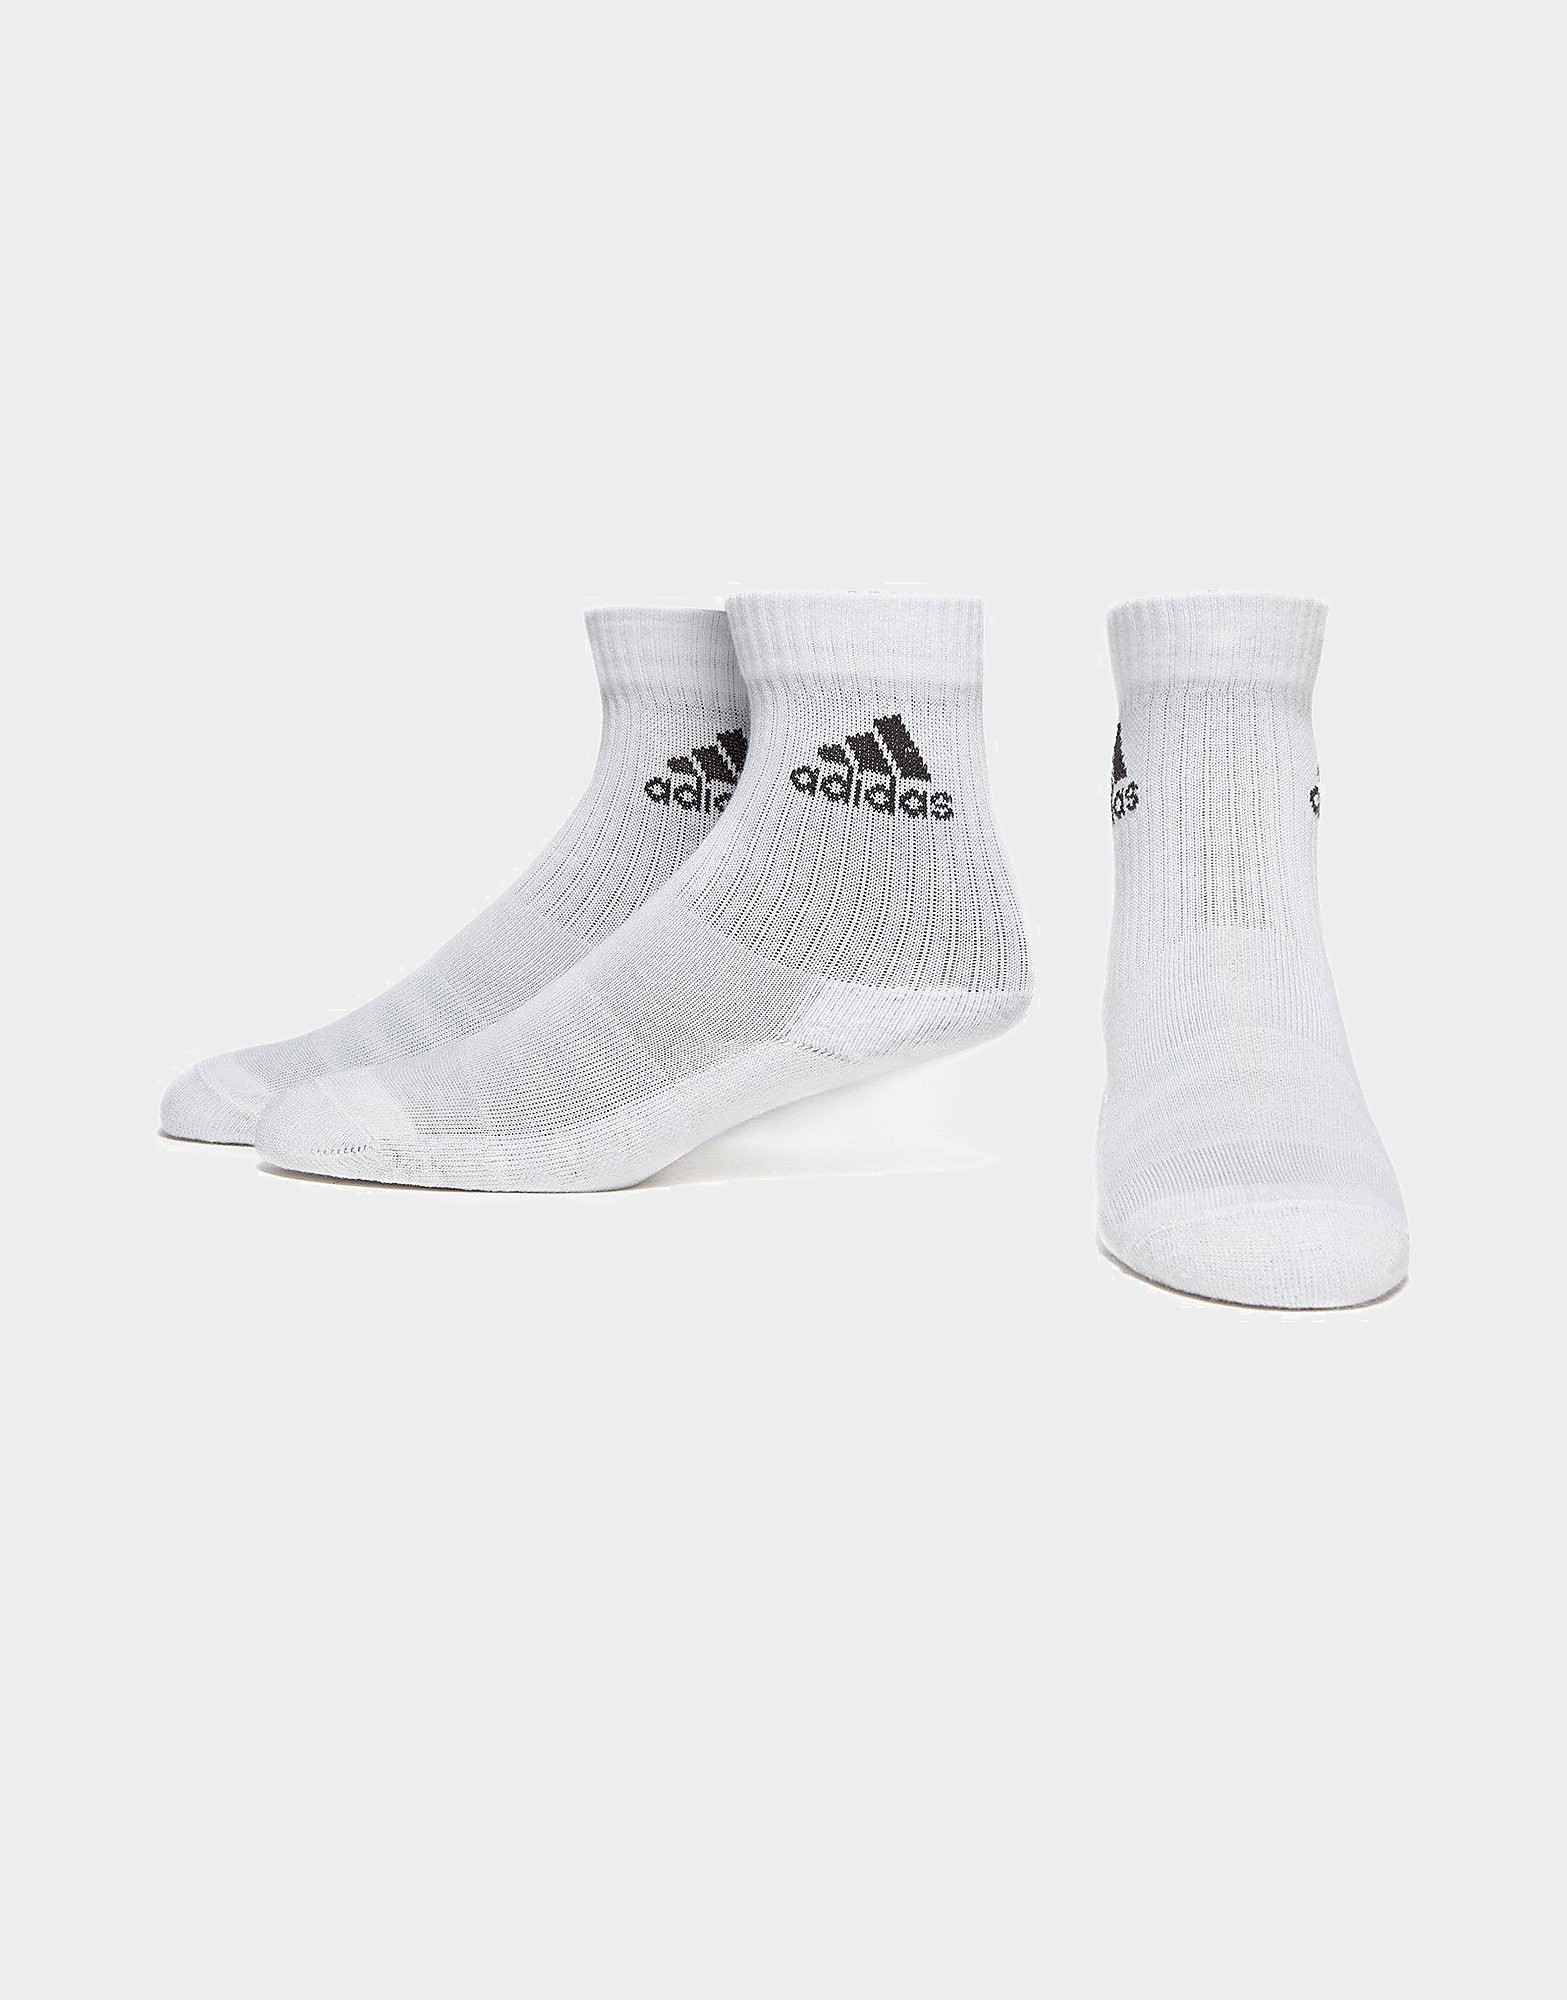 adidas 3 Stripe Performance Crew 3 Pack Socks